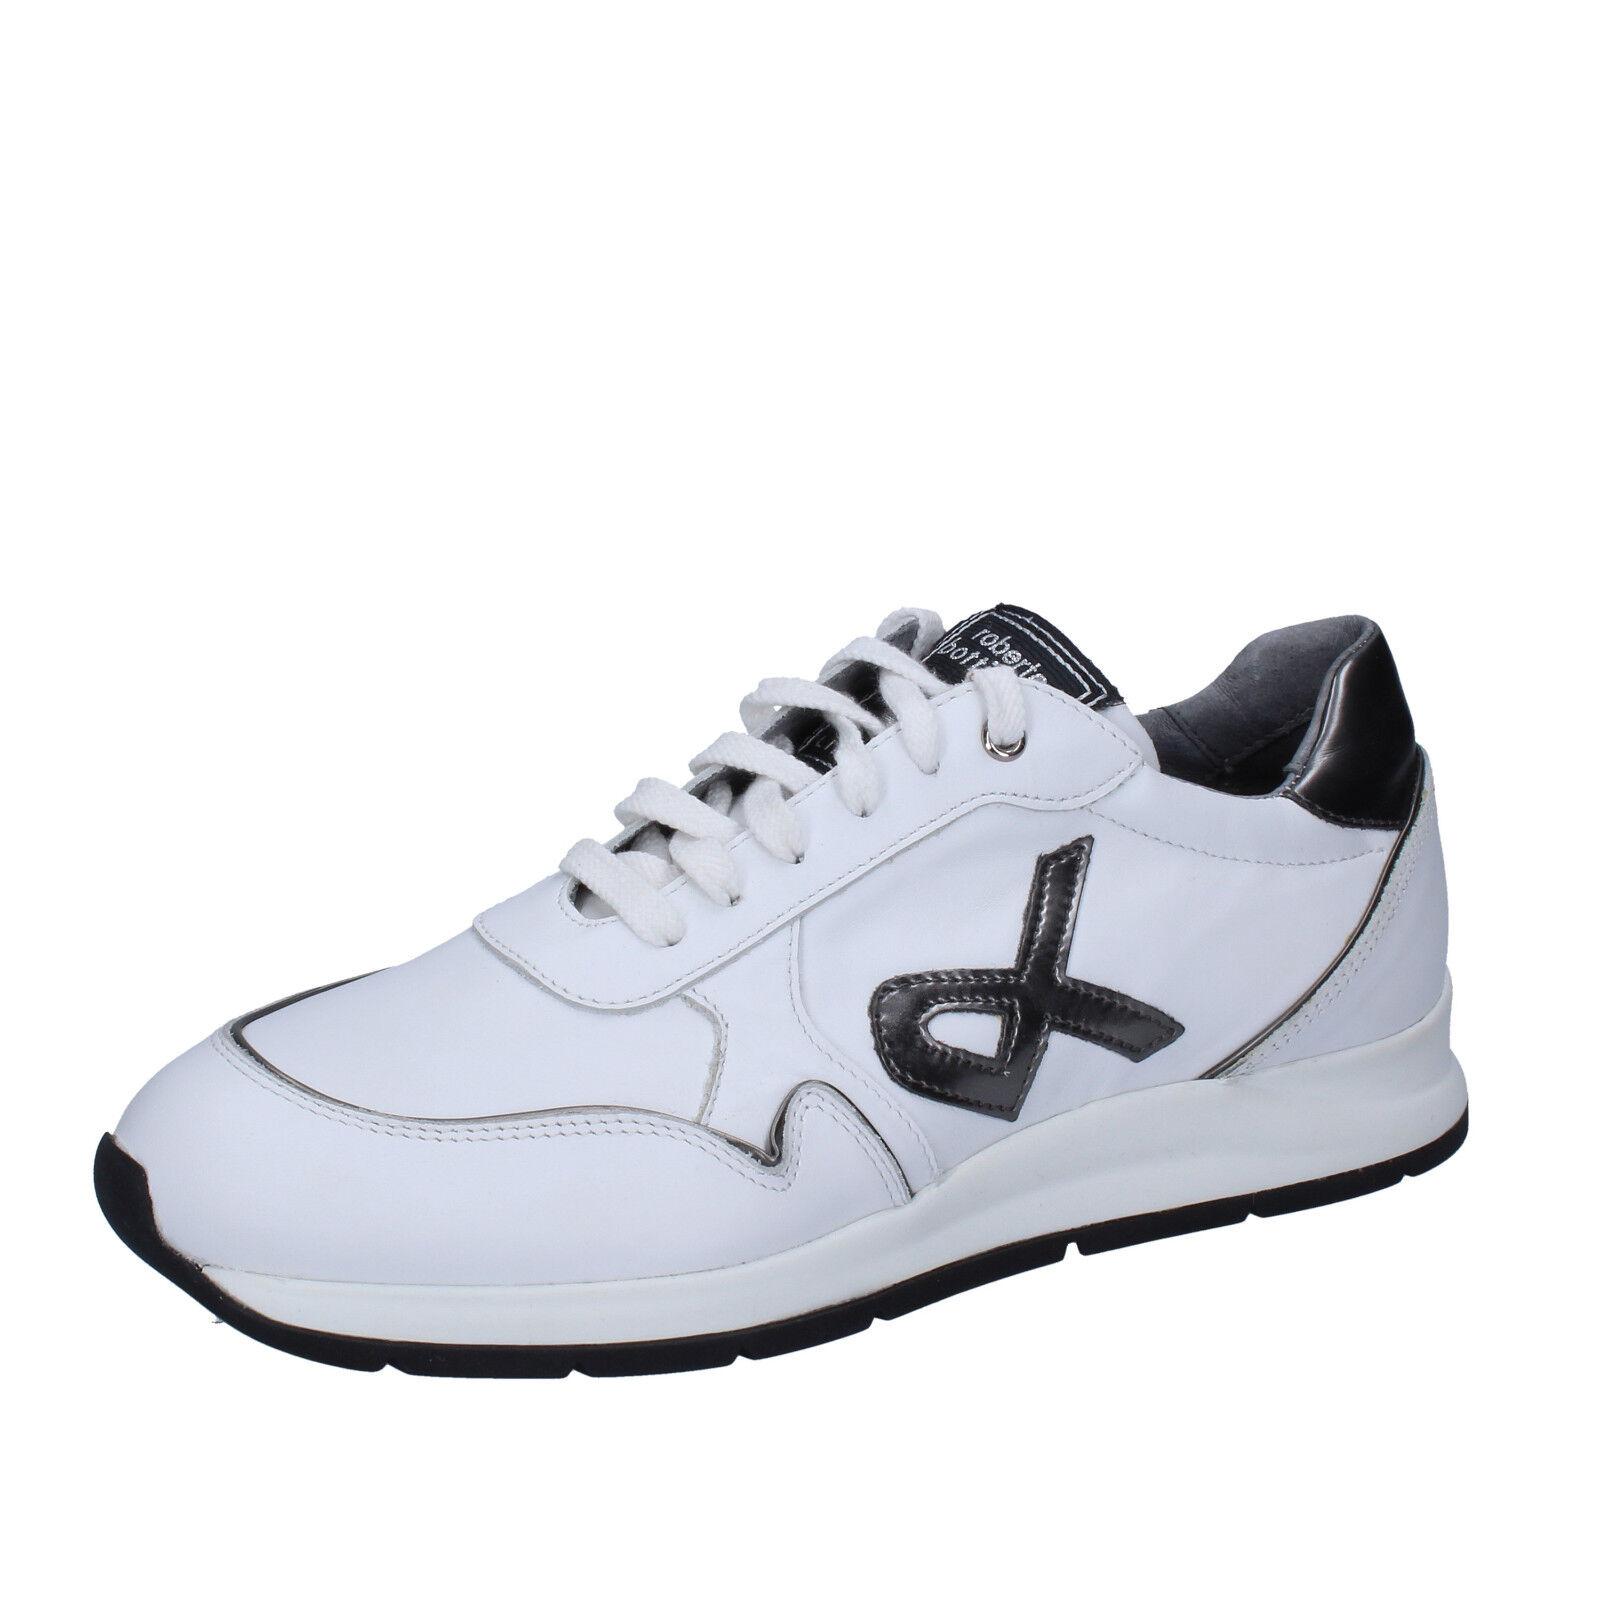 Men's shoes ROBERTO BOTTICELLI 11 (EU 44) sneakers white leather BT542-44